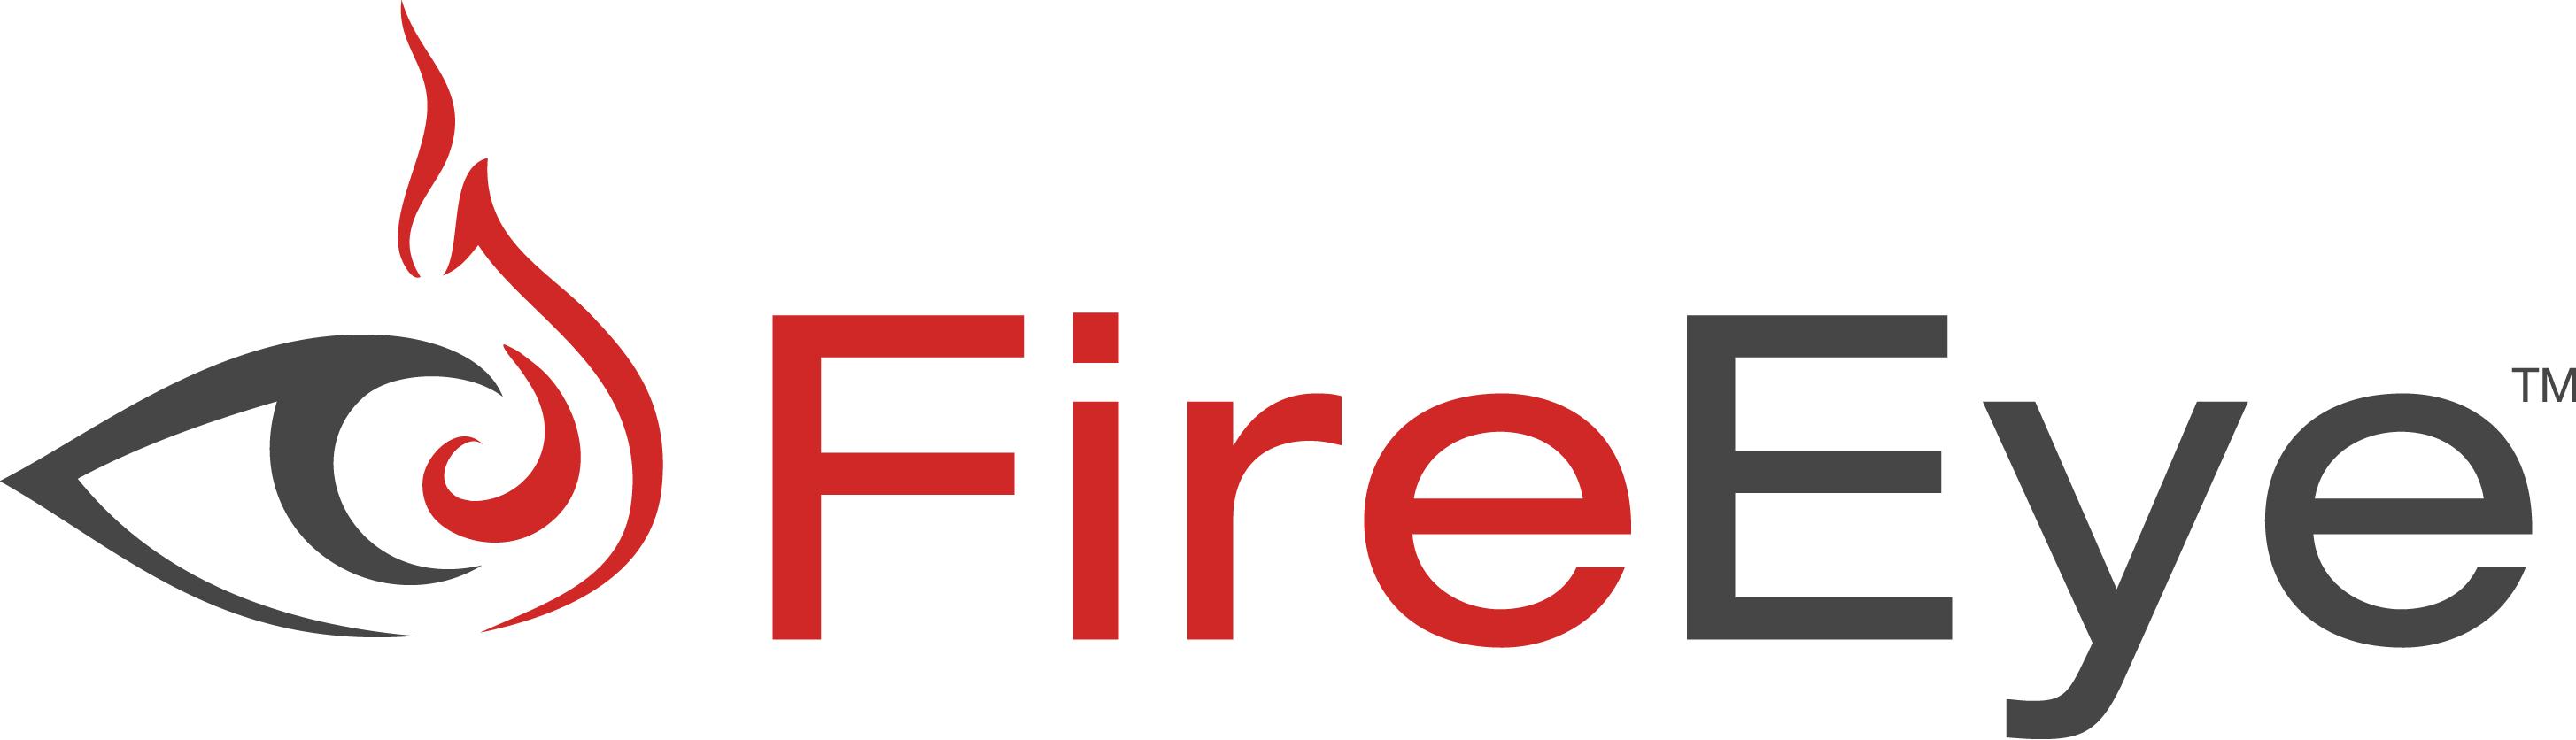 Etp Stock Quote Fireeye Stock Price News & Analysis Nasdaqfeye  Marketbeat